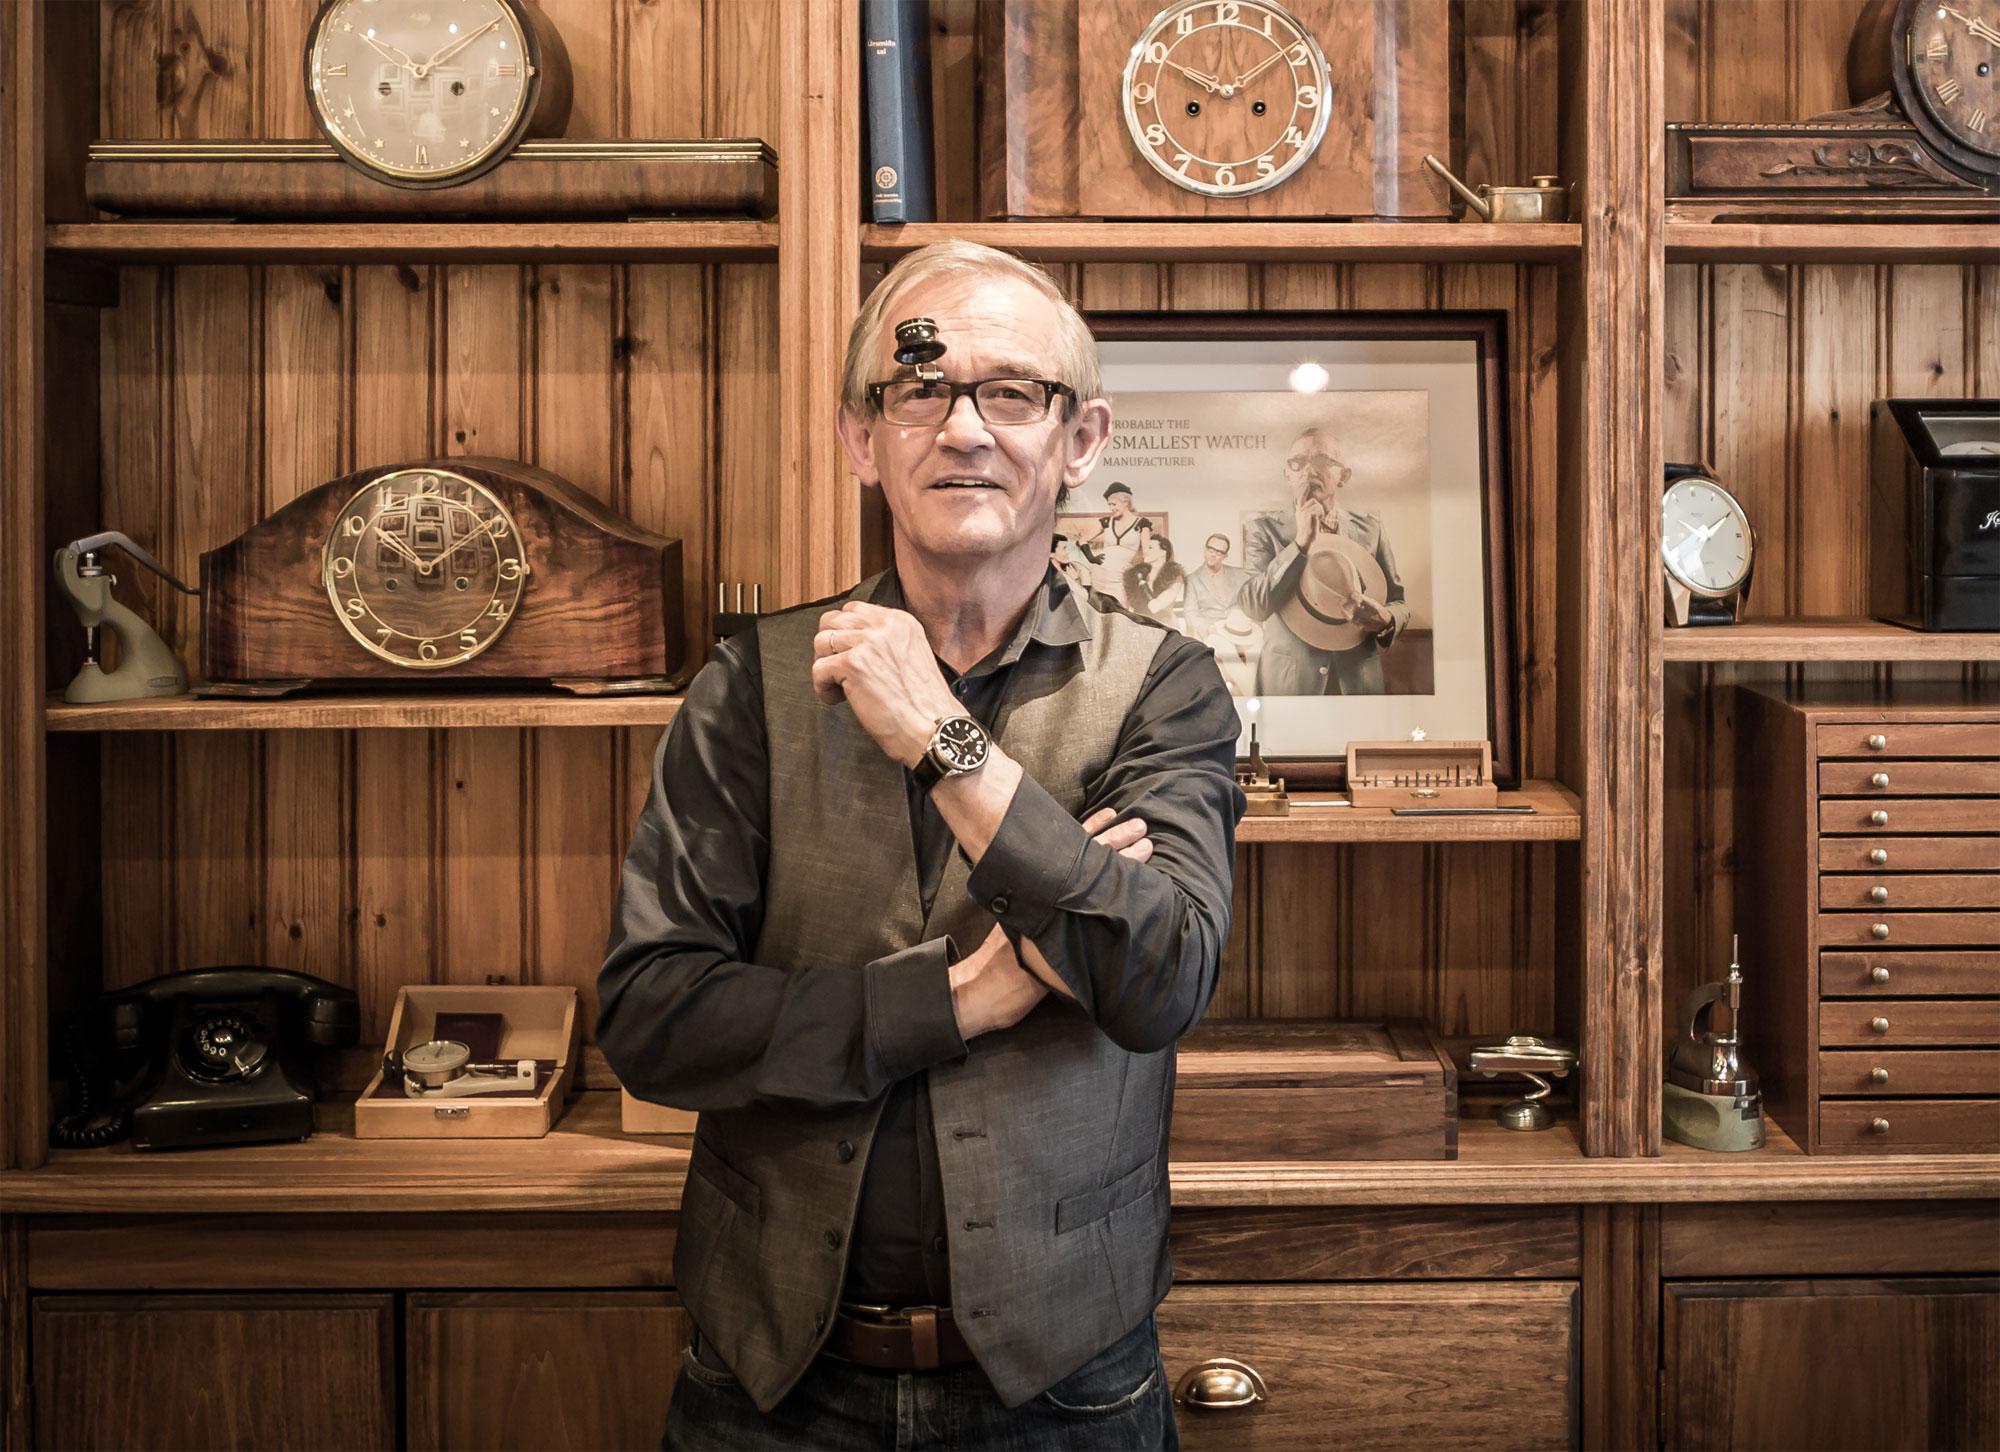 Reykjavik's J.S. Watch Co: The World's Smallest Watchmaker